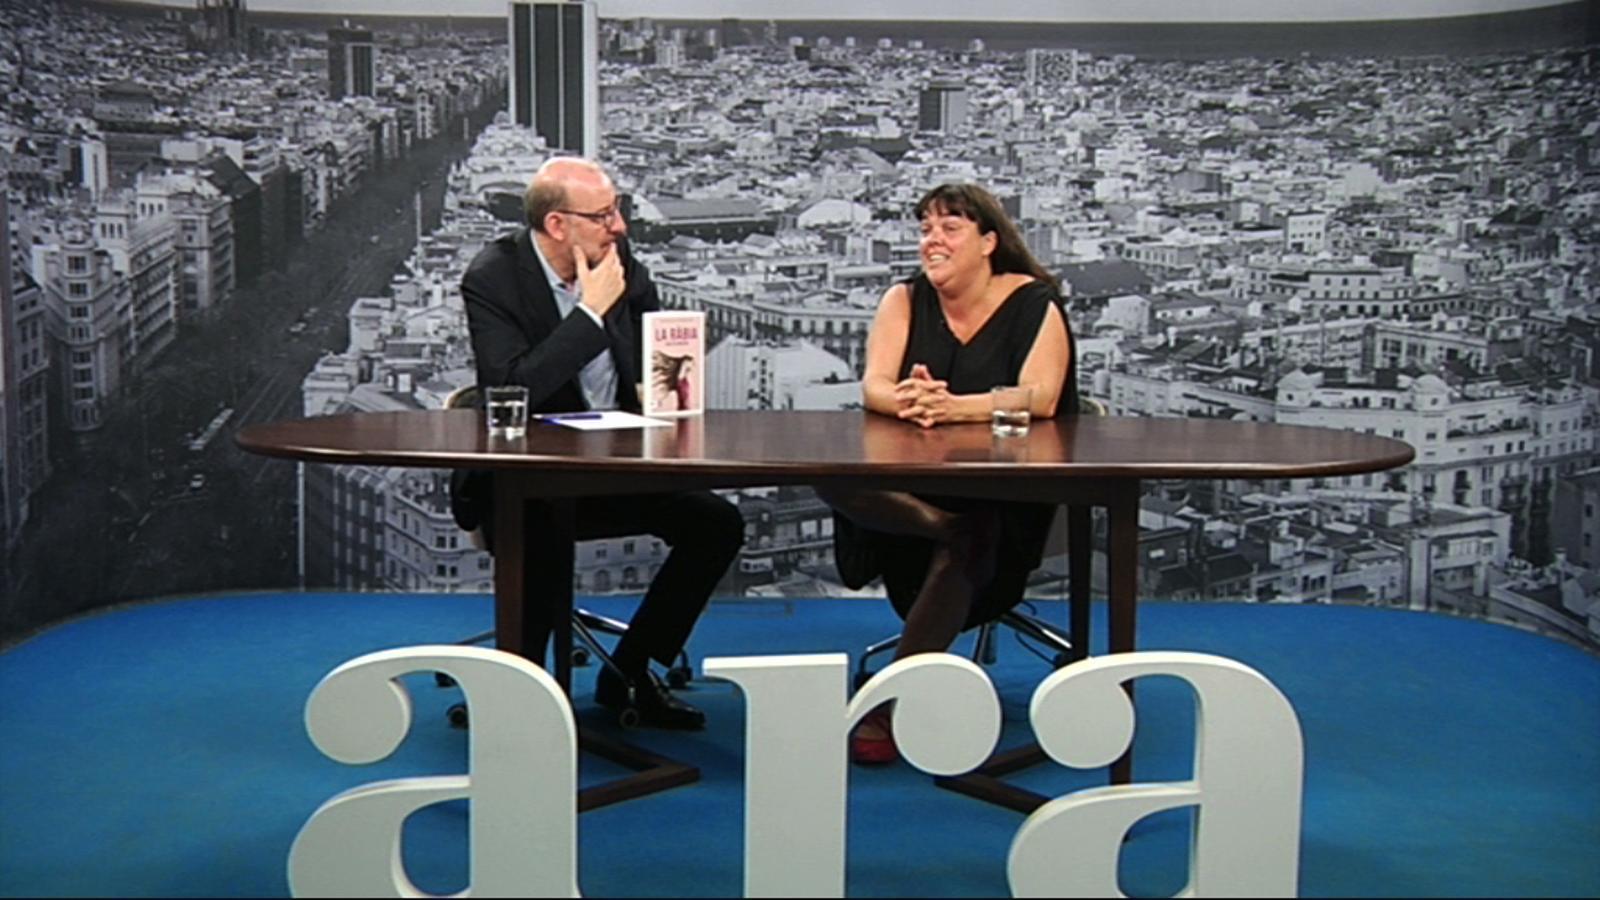 Entrevista d'Antoni Bassas a Lolita Bosch